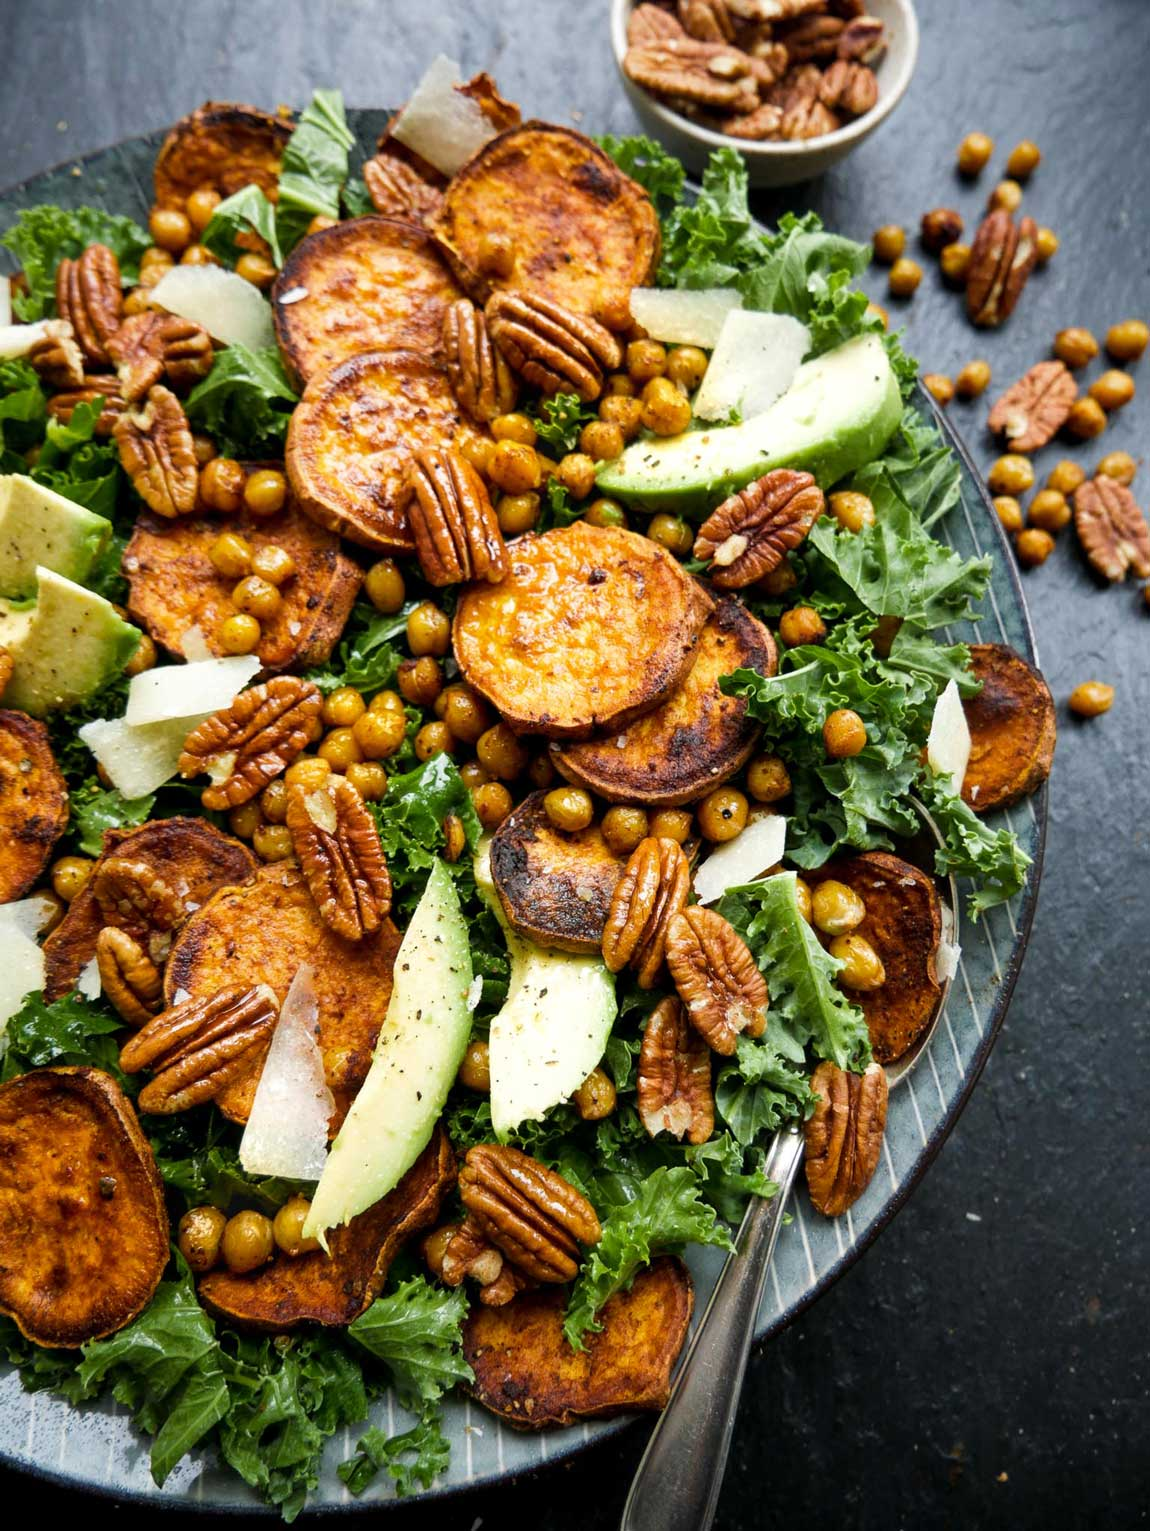 vegansk salatopskrift på grønkålssalat